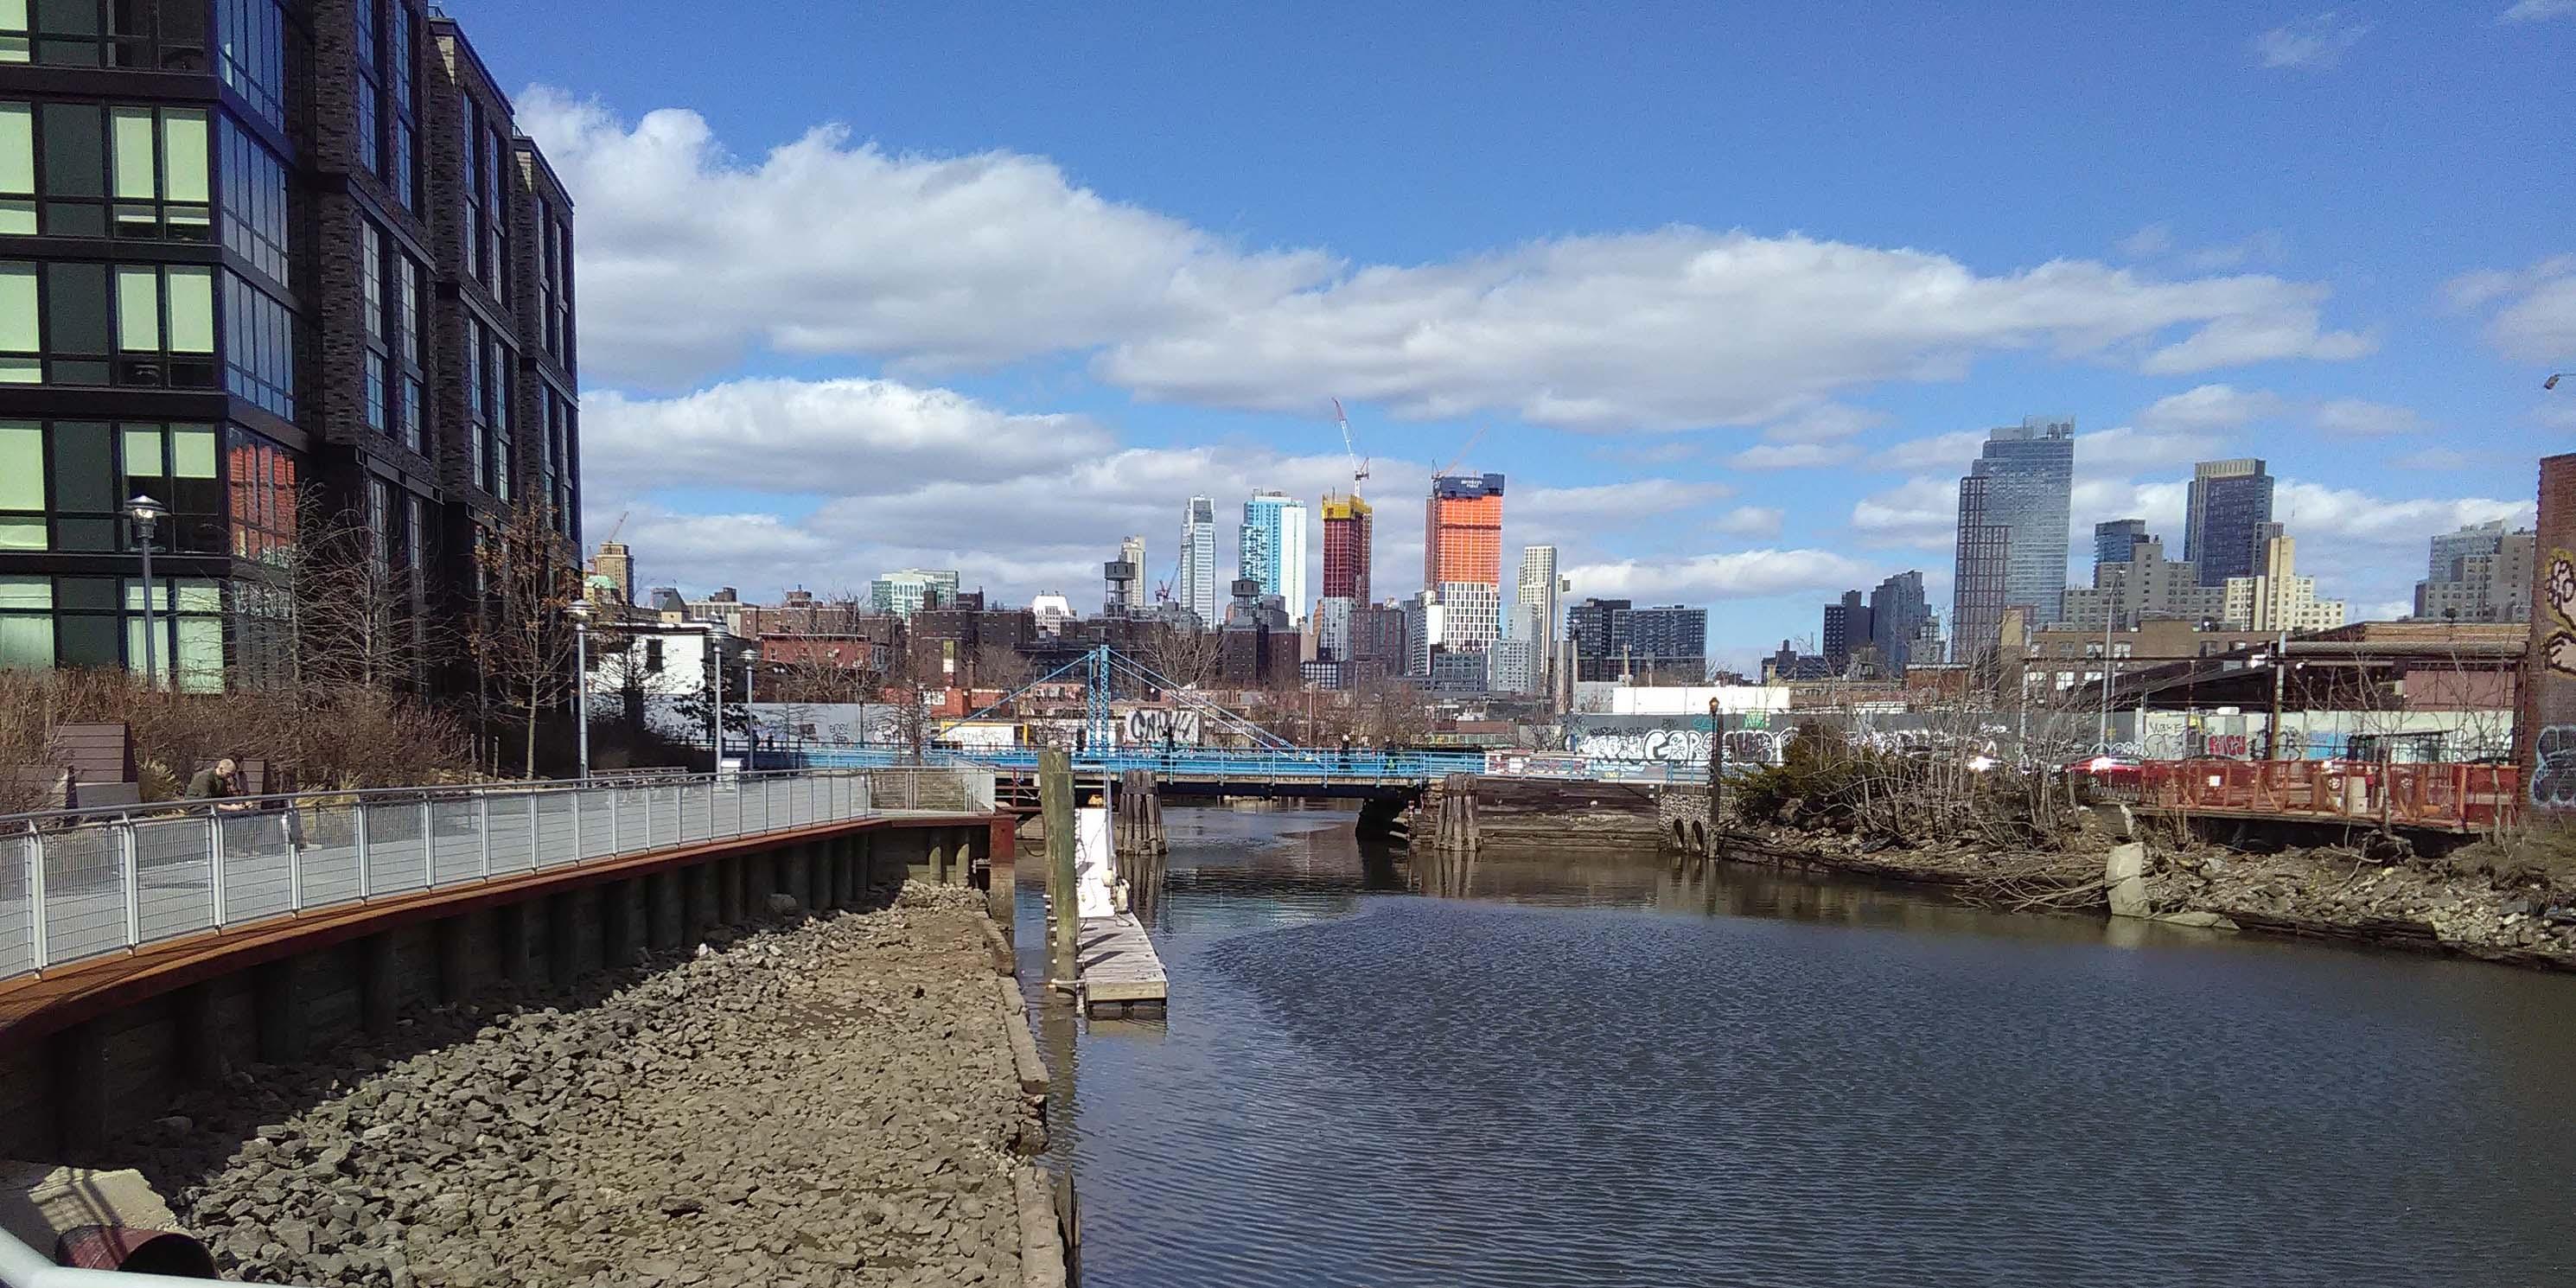 The Gowanus Canal